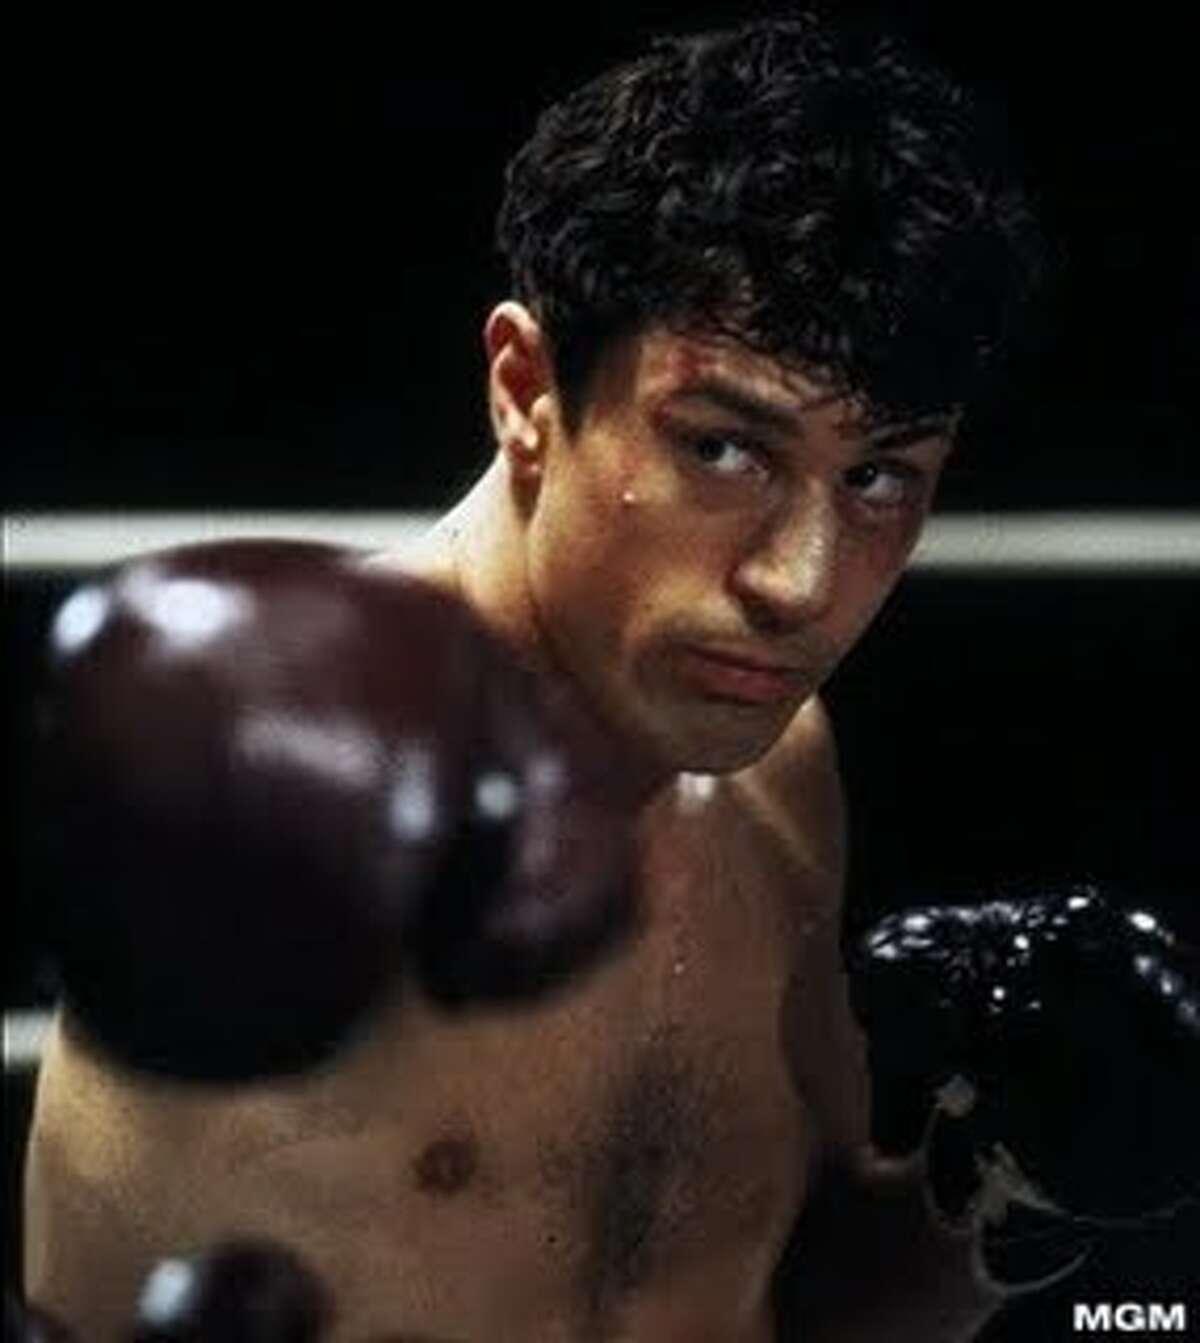 'Raging Bull' - Robert De Niro stars as Jake La Motta in this career-defining role.